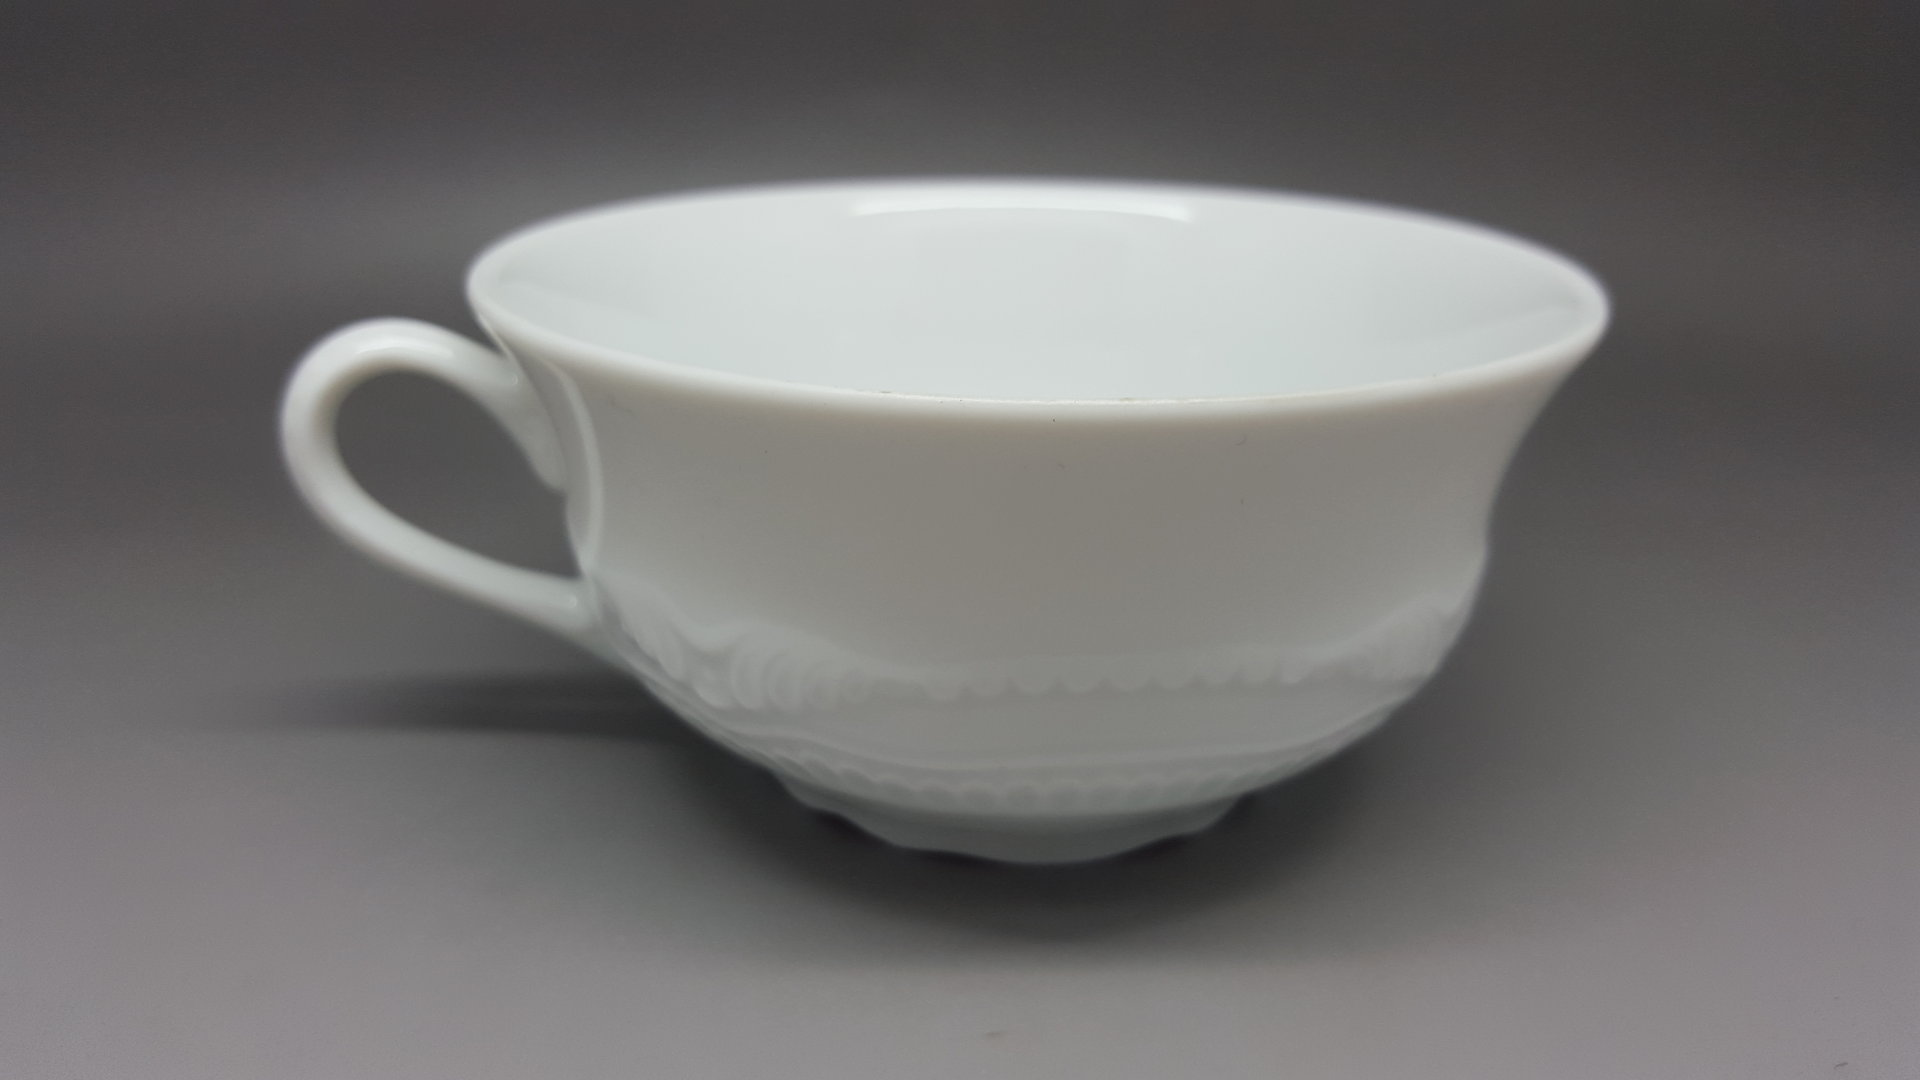 tasse the limoges la boutique de porcelaine blanche. Black Bedroom Furniture Sets. Home Design Ideas